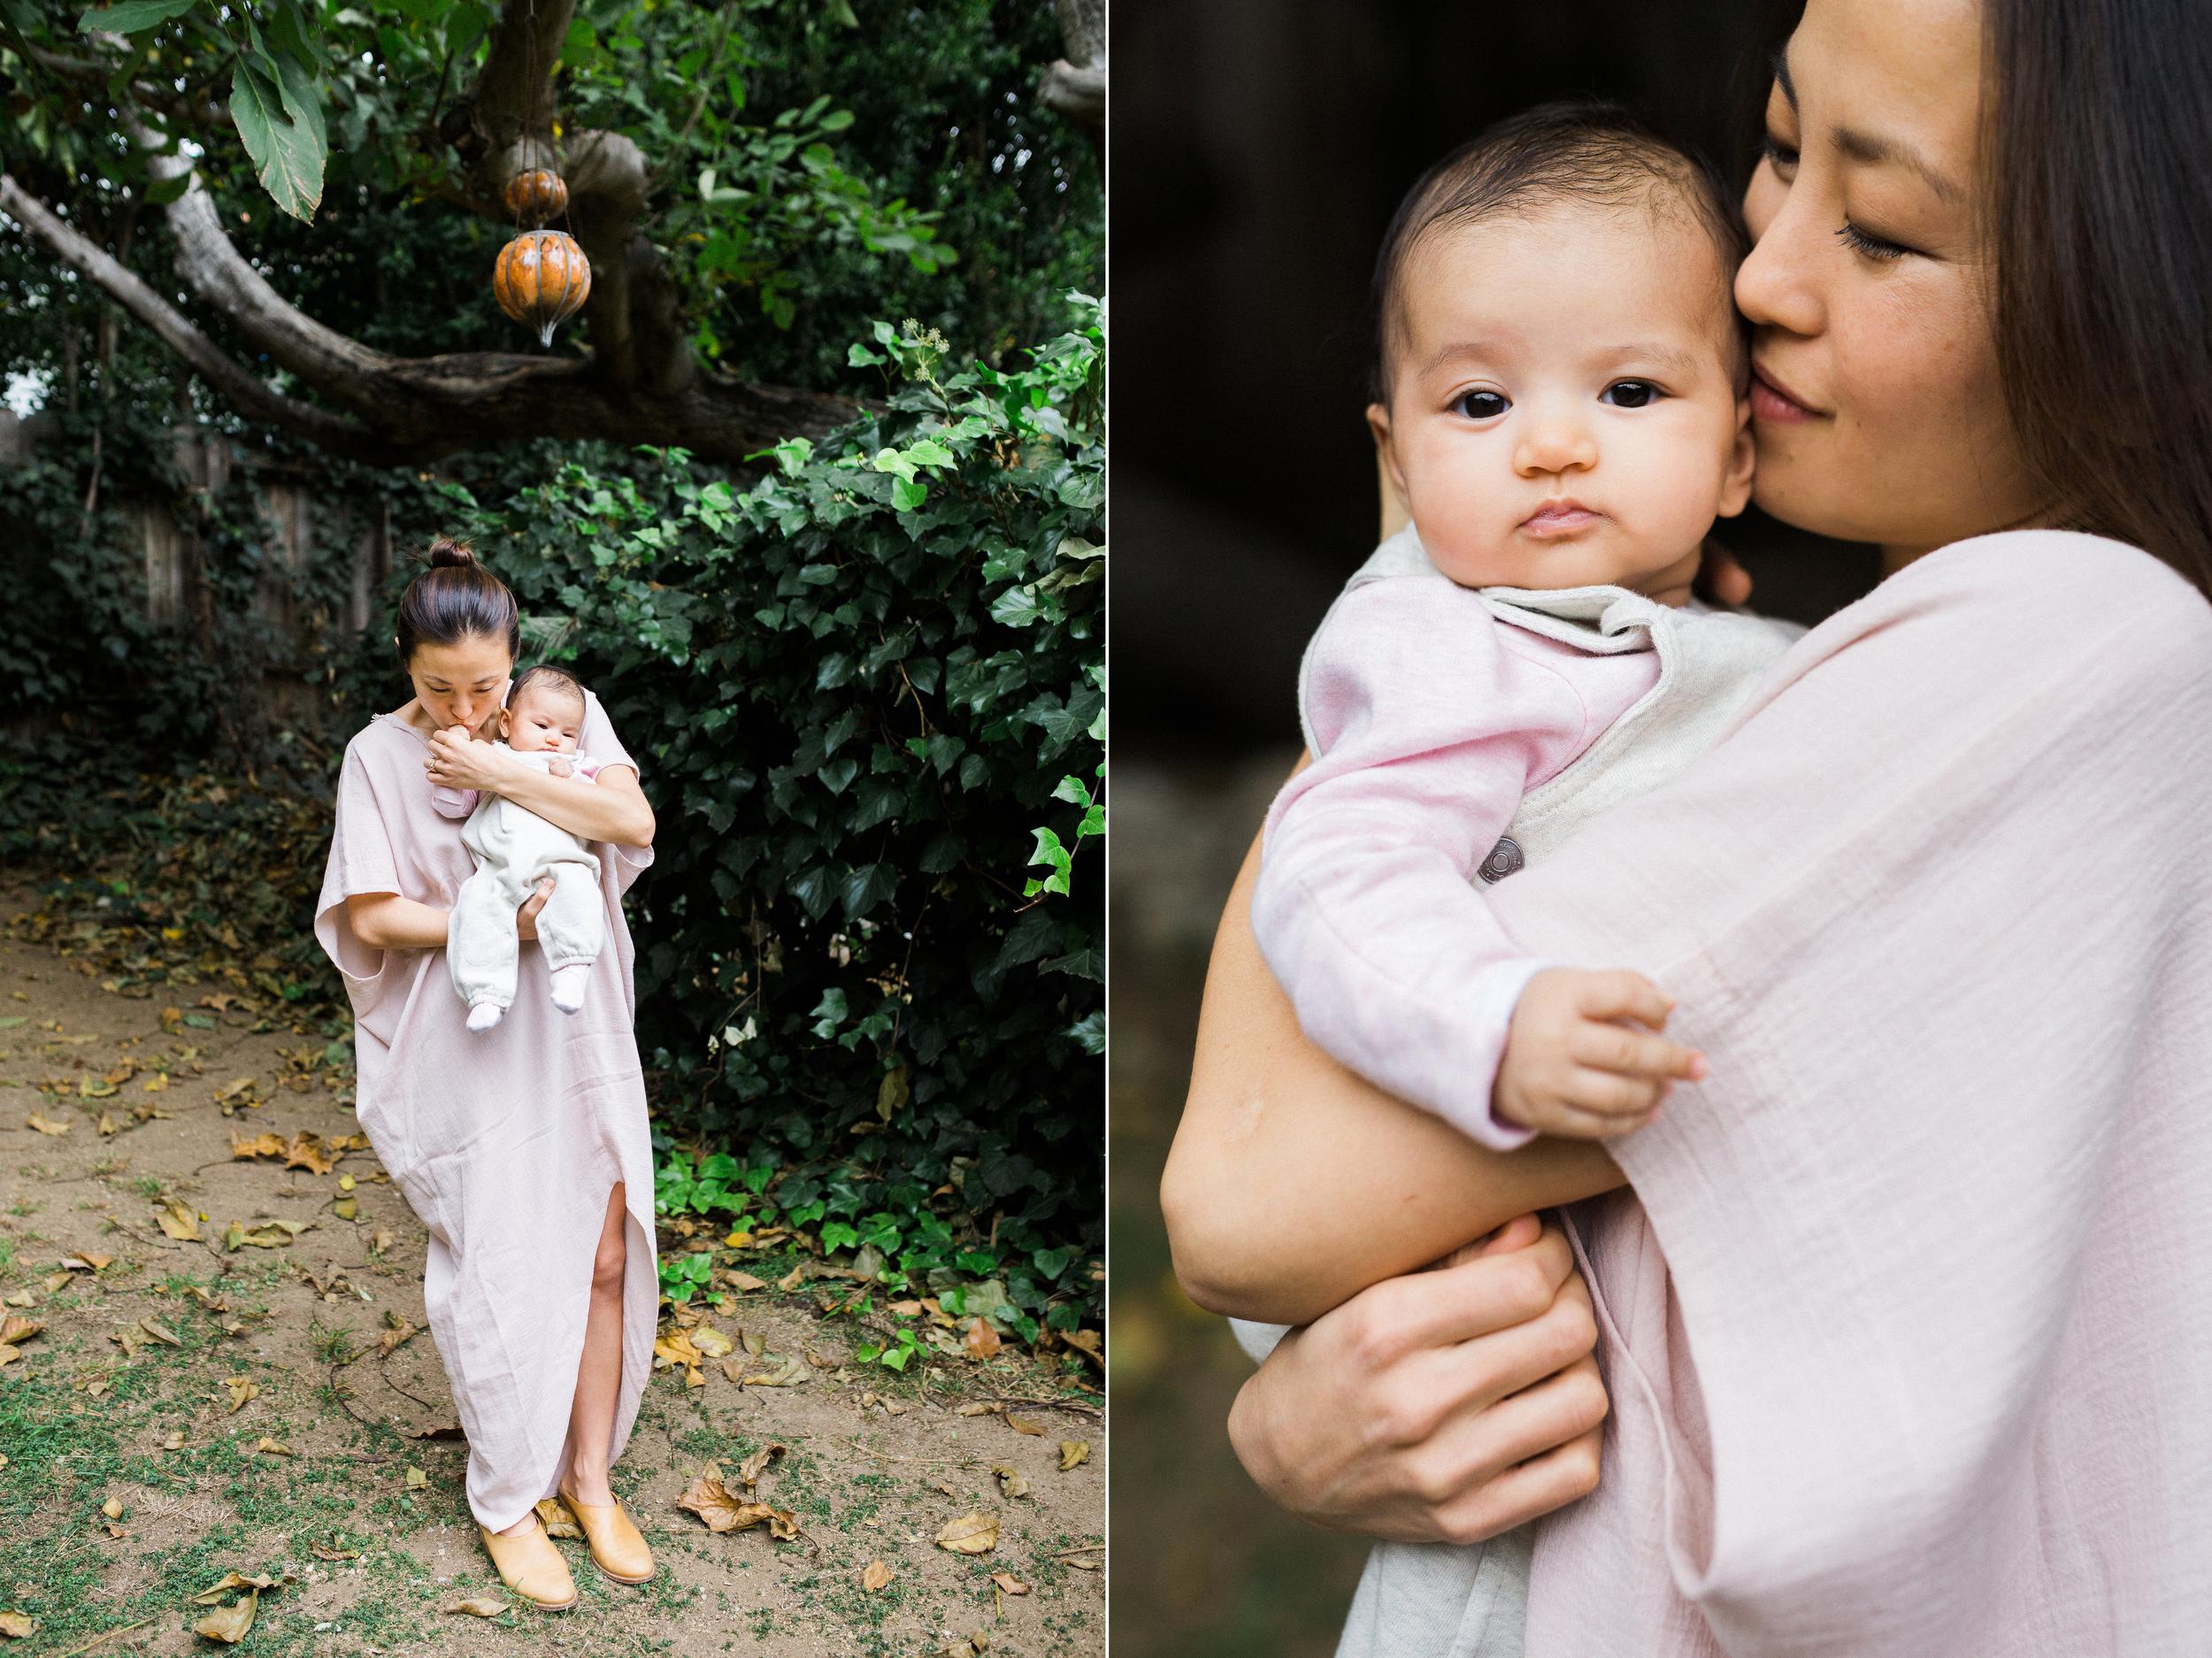 mehana-family-session_la-los-angeles-family-photographer-laurel-canyon_4.jpg